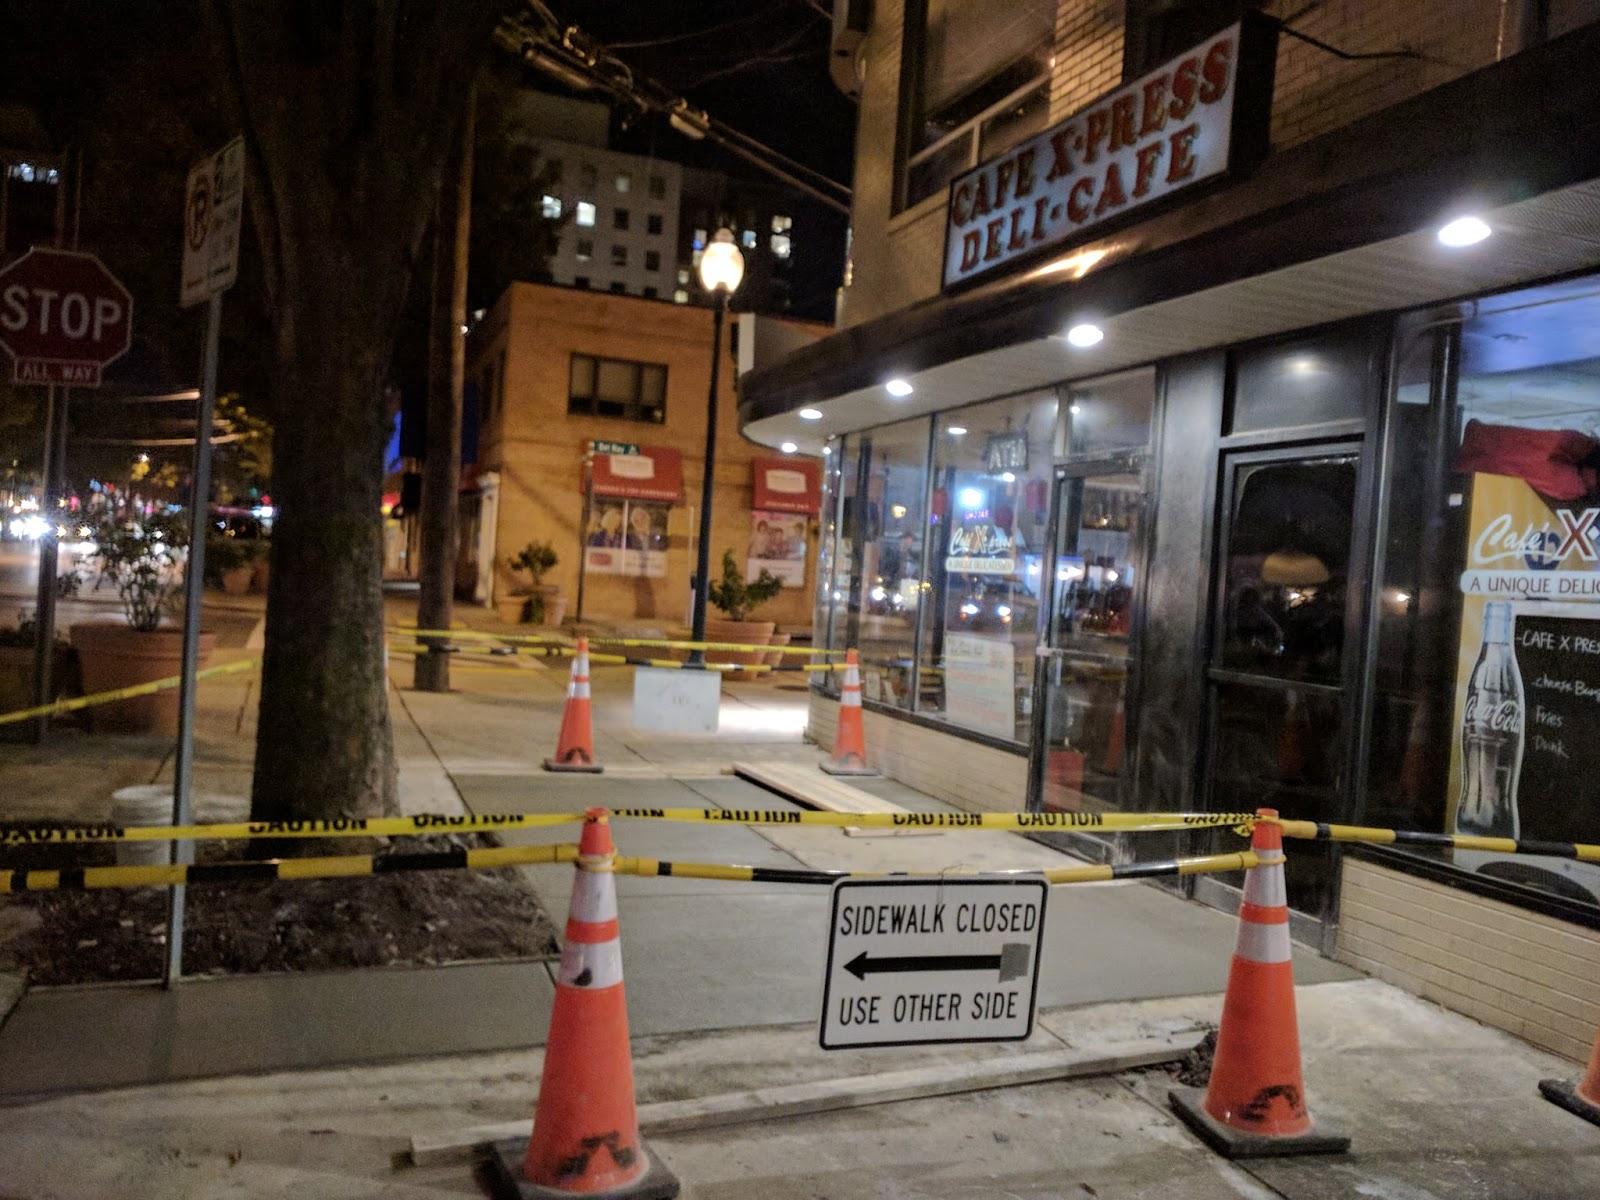 835c3219fc6 More sidewalk repairs have begun in the Woodmont Triangle neighborhood in  Bethesda. Watch for sidewalk closures on several streets